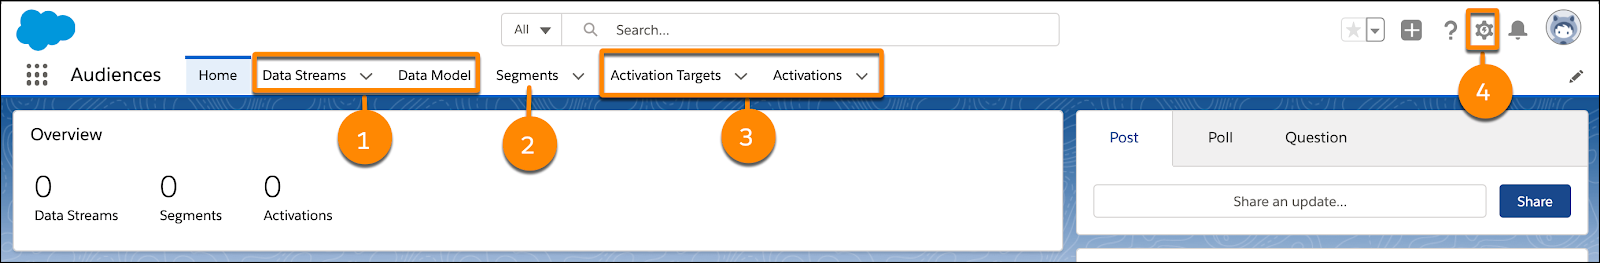 Customer 360 Audiences Home page highlighting the navigation bar.